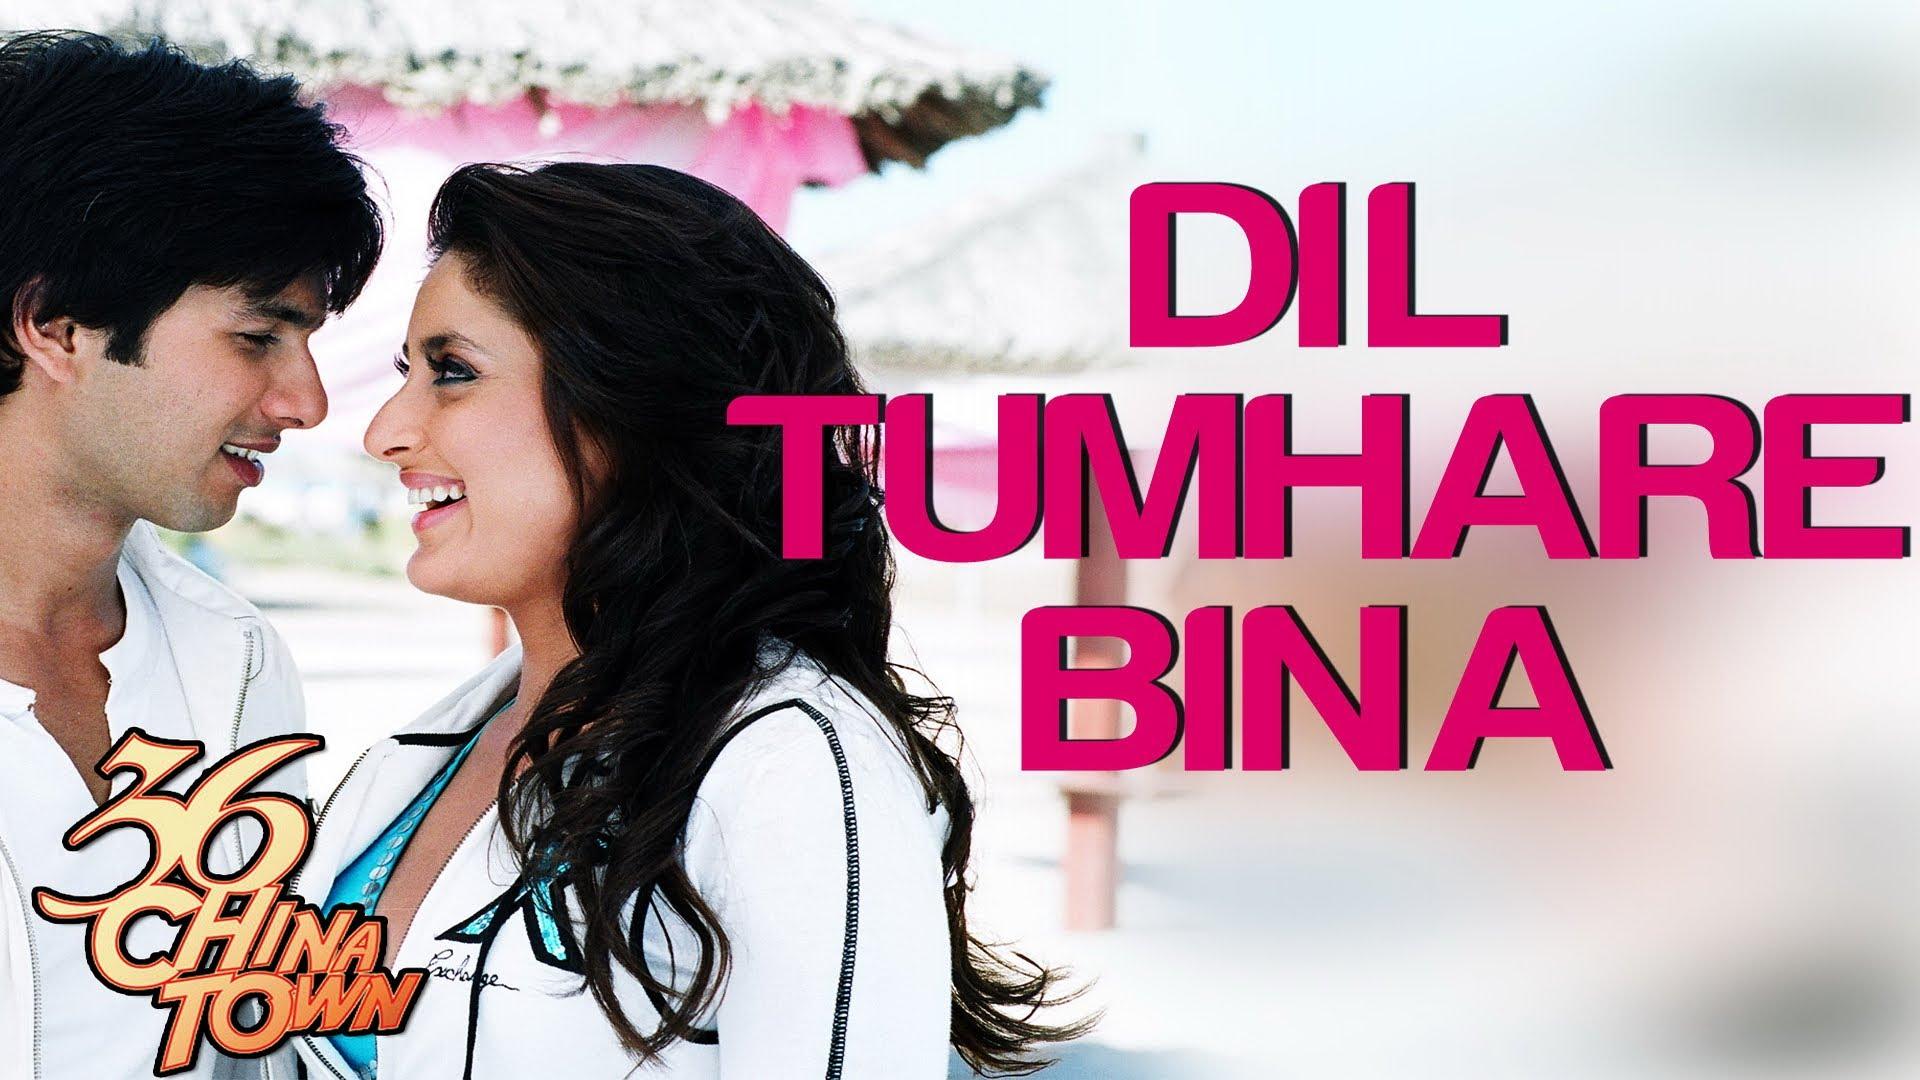 Dil Tumhare Bina - 36 China Town   Shahid & Kareena   Himesh Reshammiya & Alka Yagnik